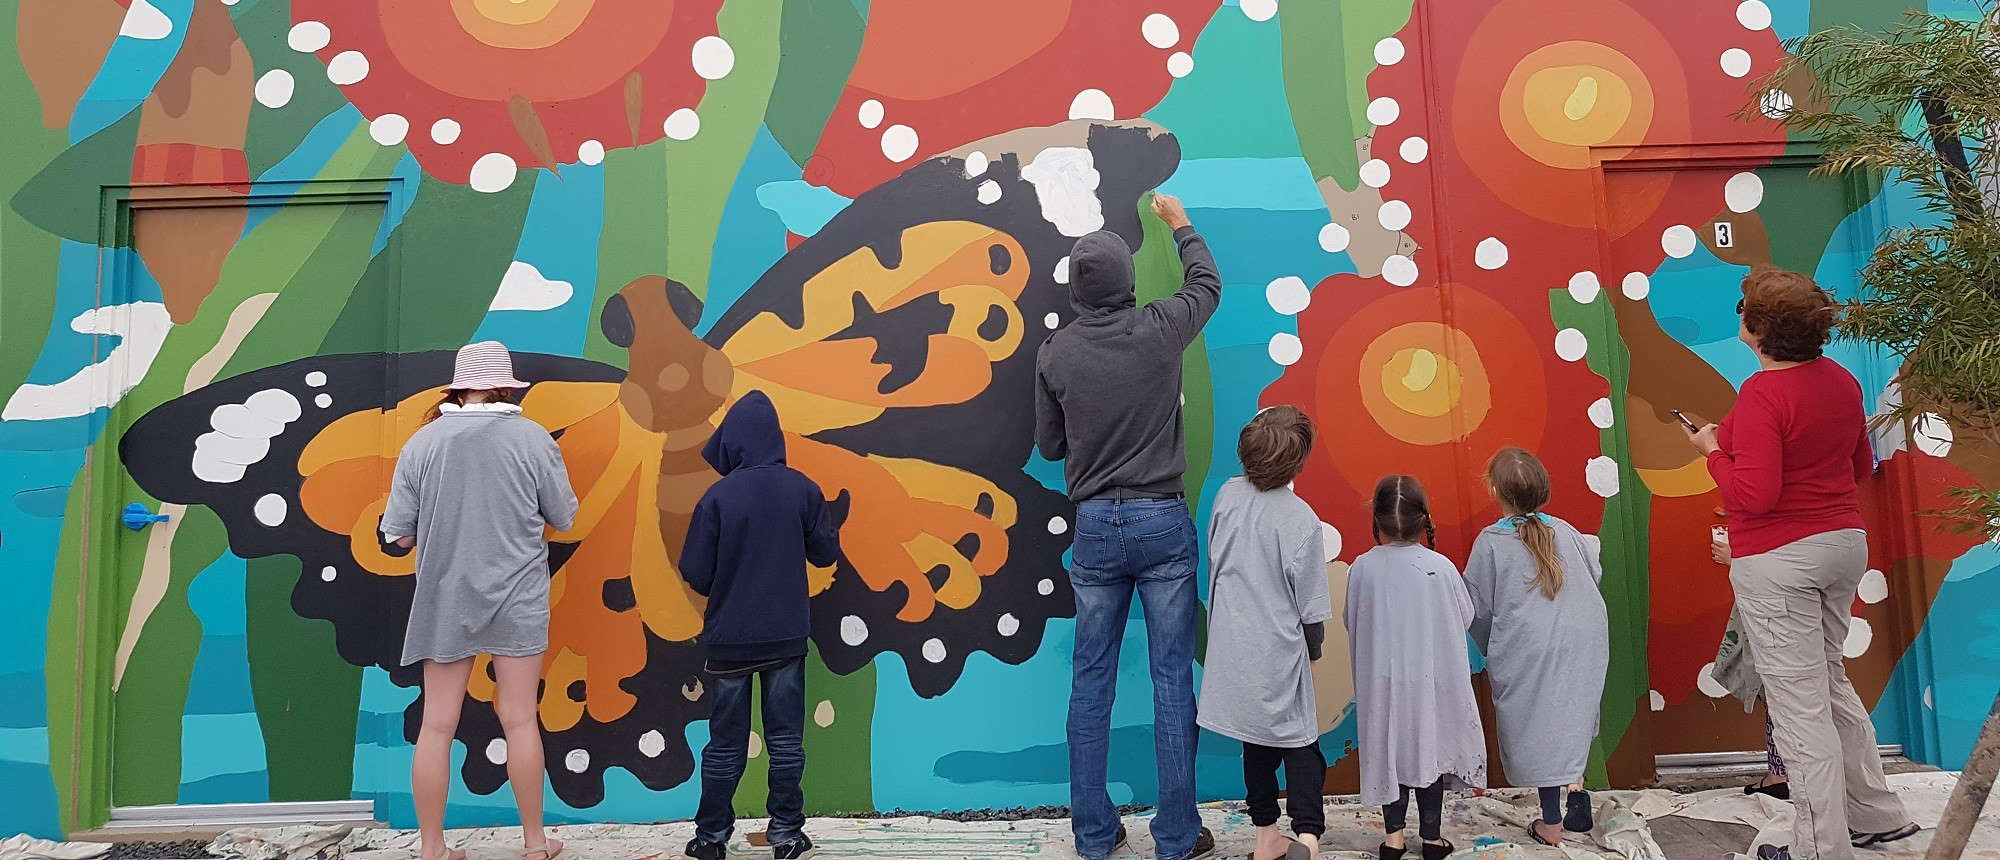 vasse-public-art-mcvee-mural-vasse-village-2000x860